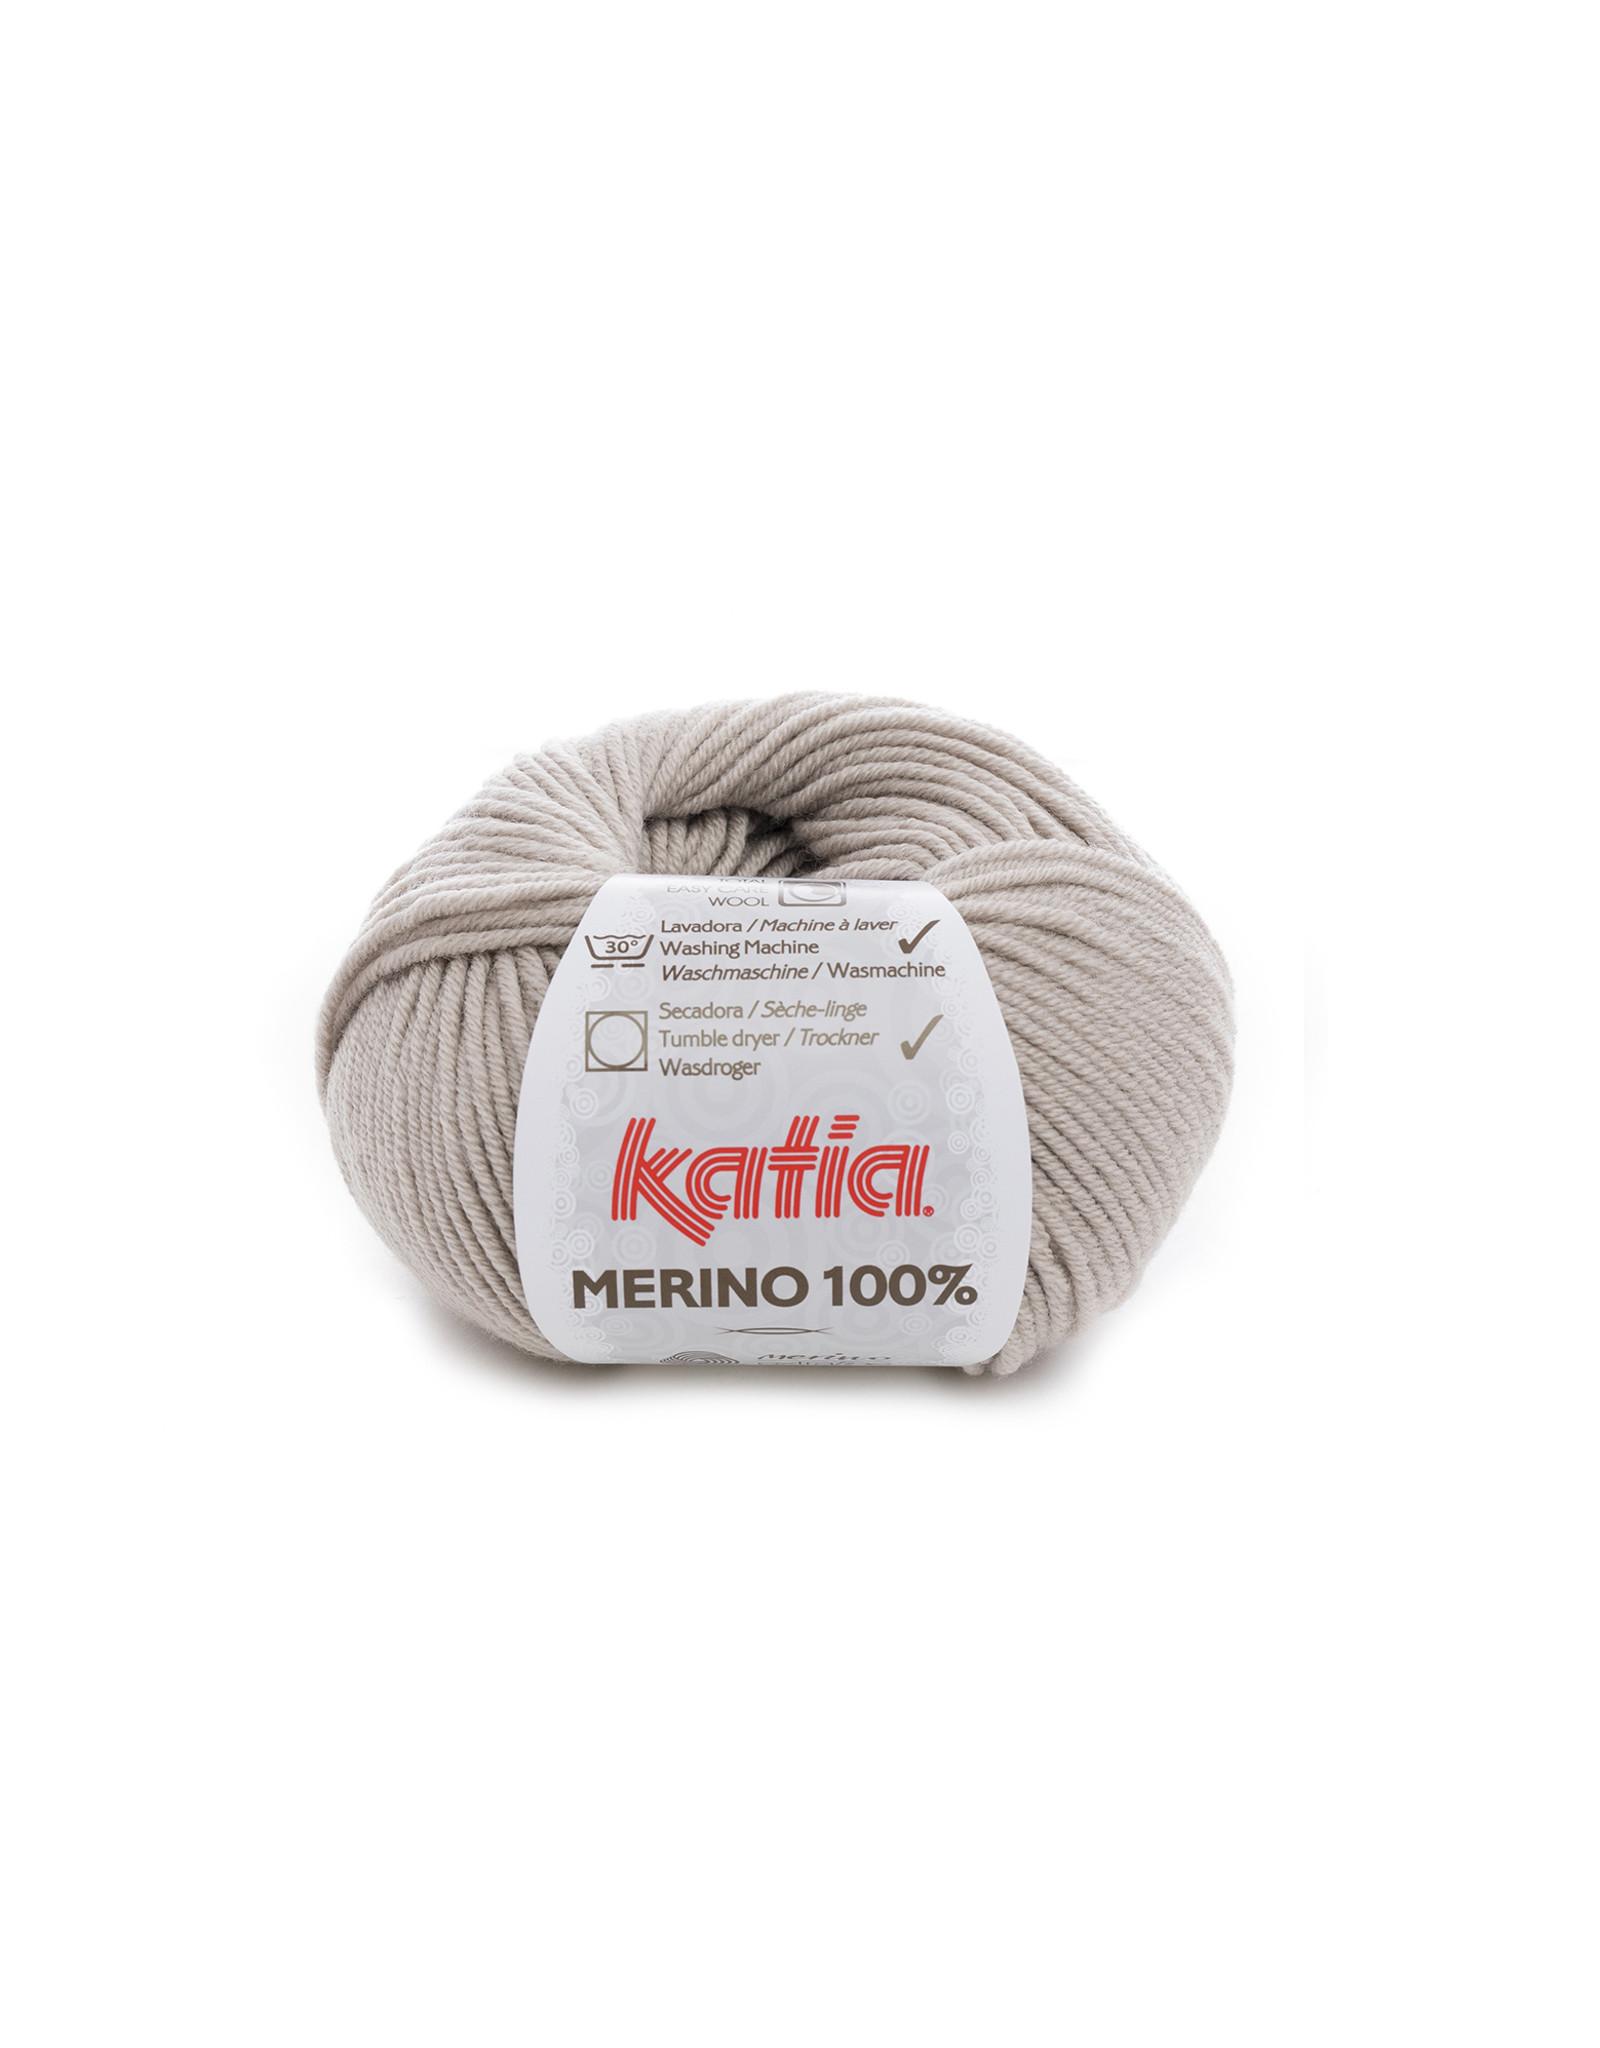 Katia Katia Merino 100% - 40 - Steengrijs - bundel 5 x 50 gr.